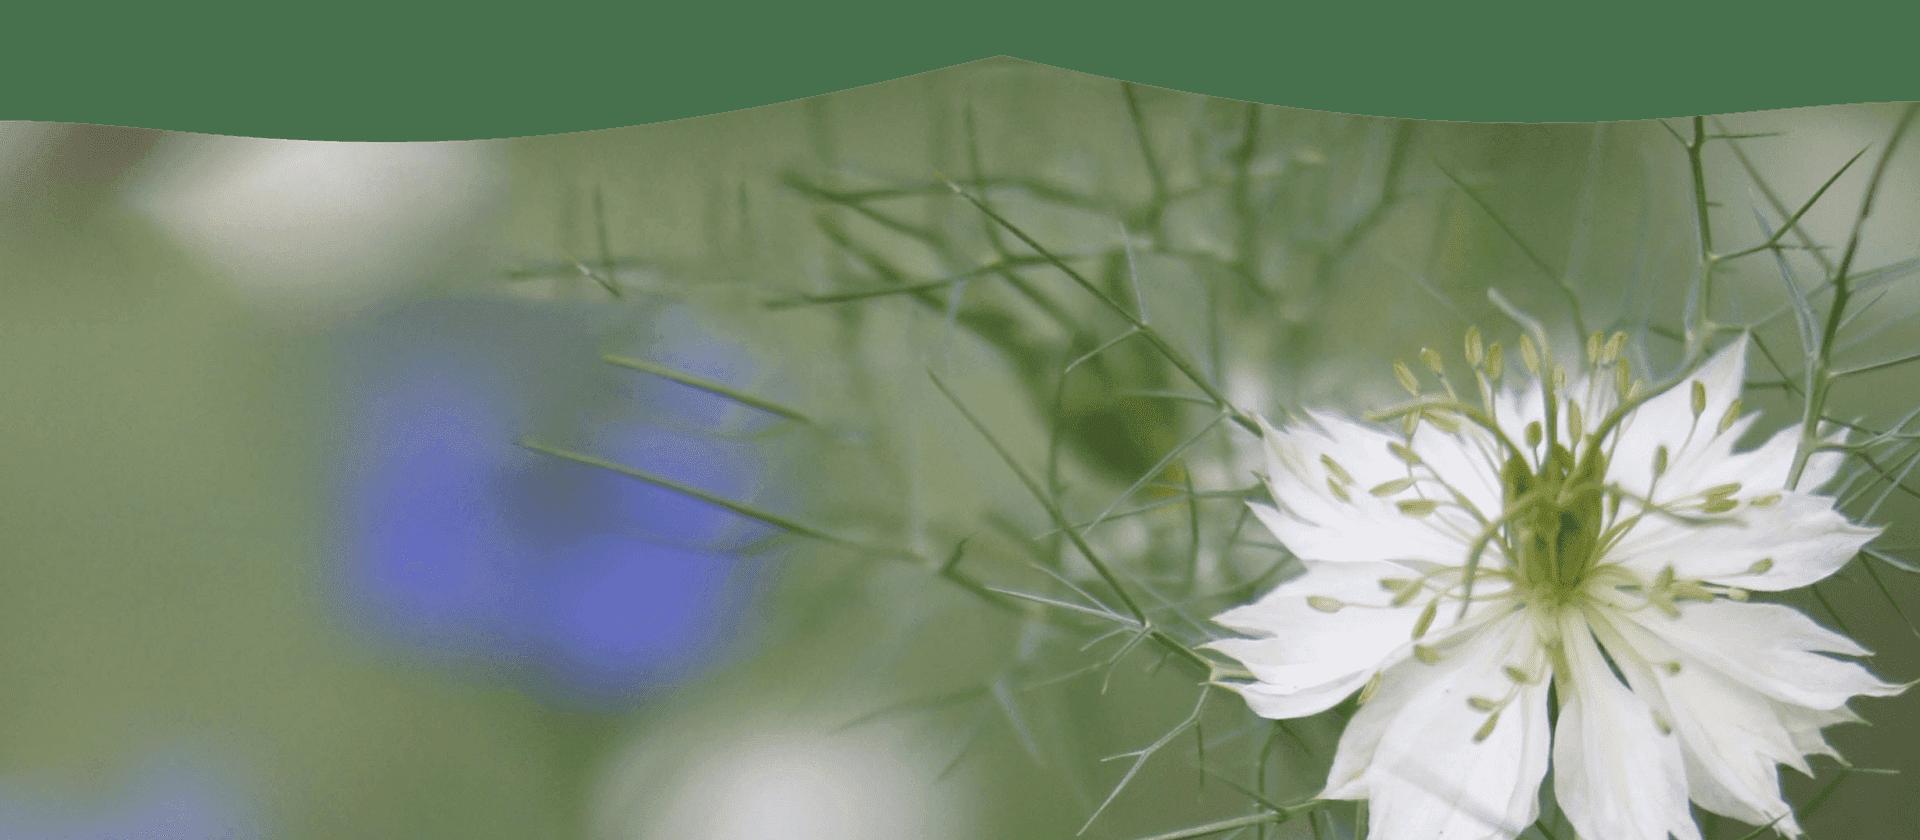 flower design background behind contact information